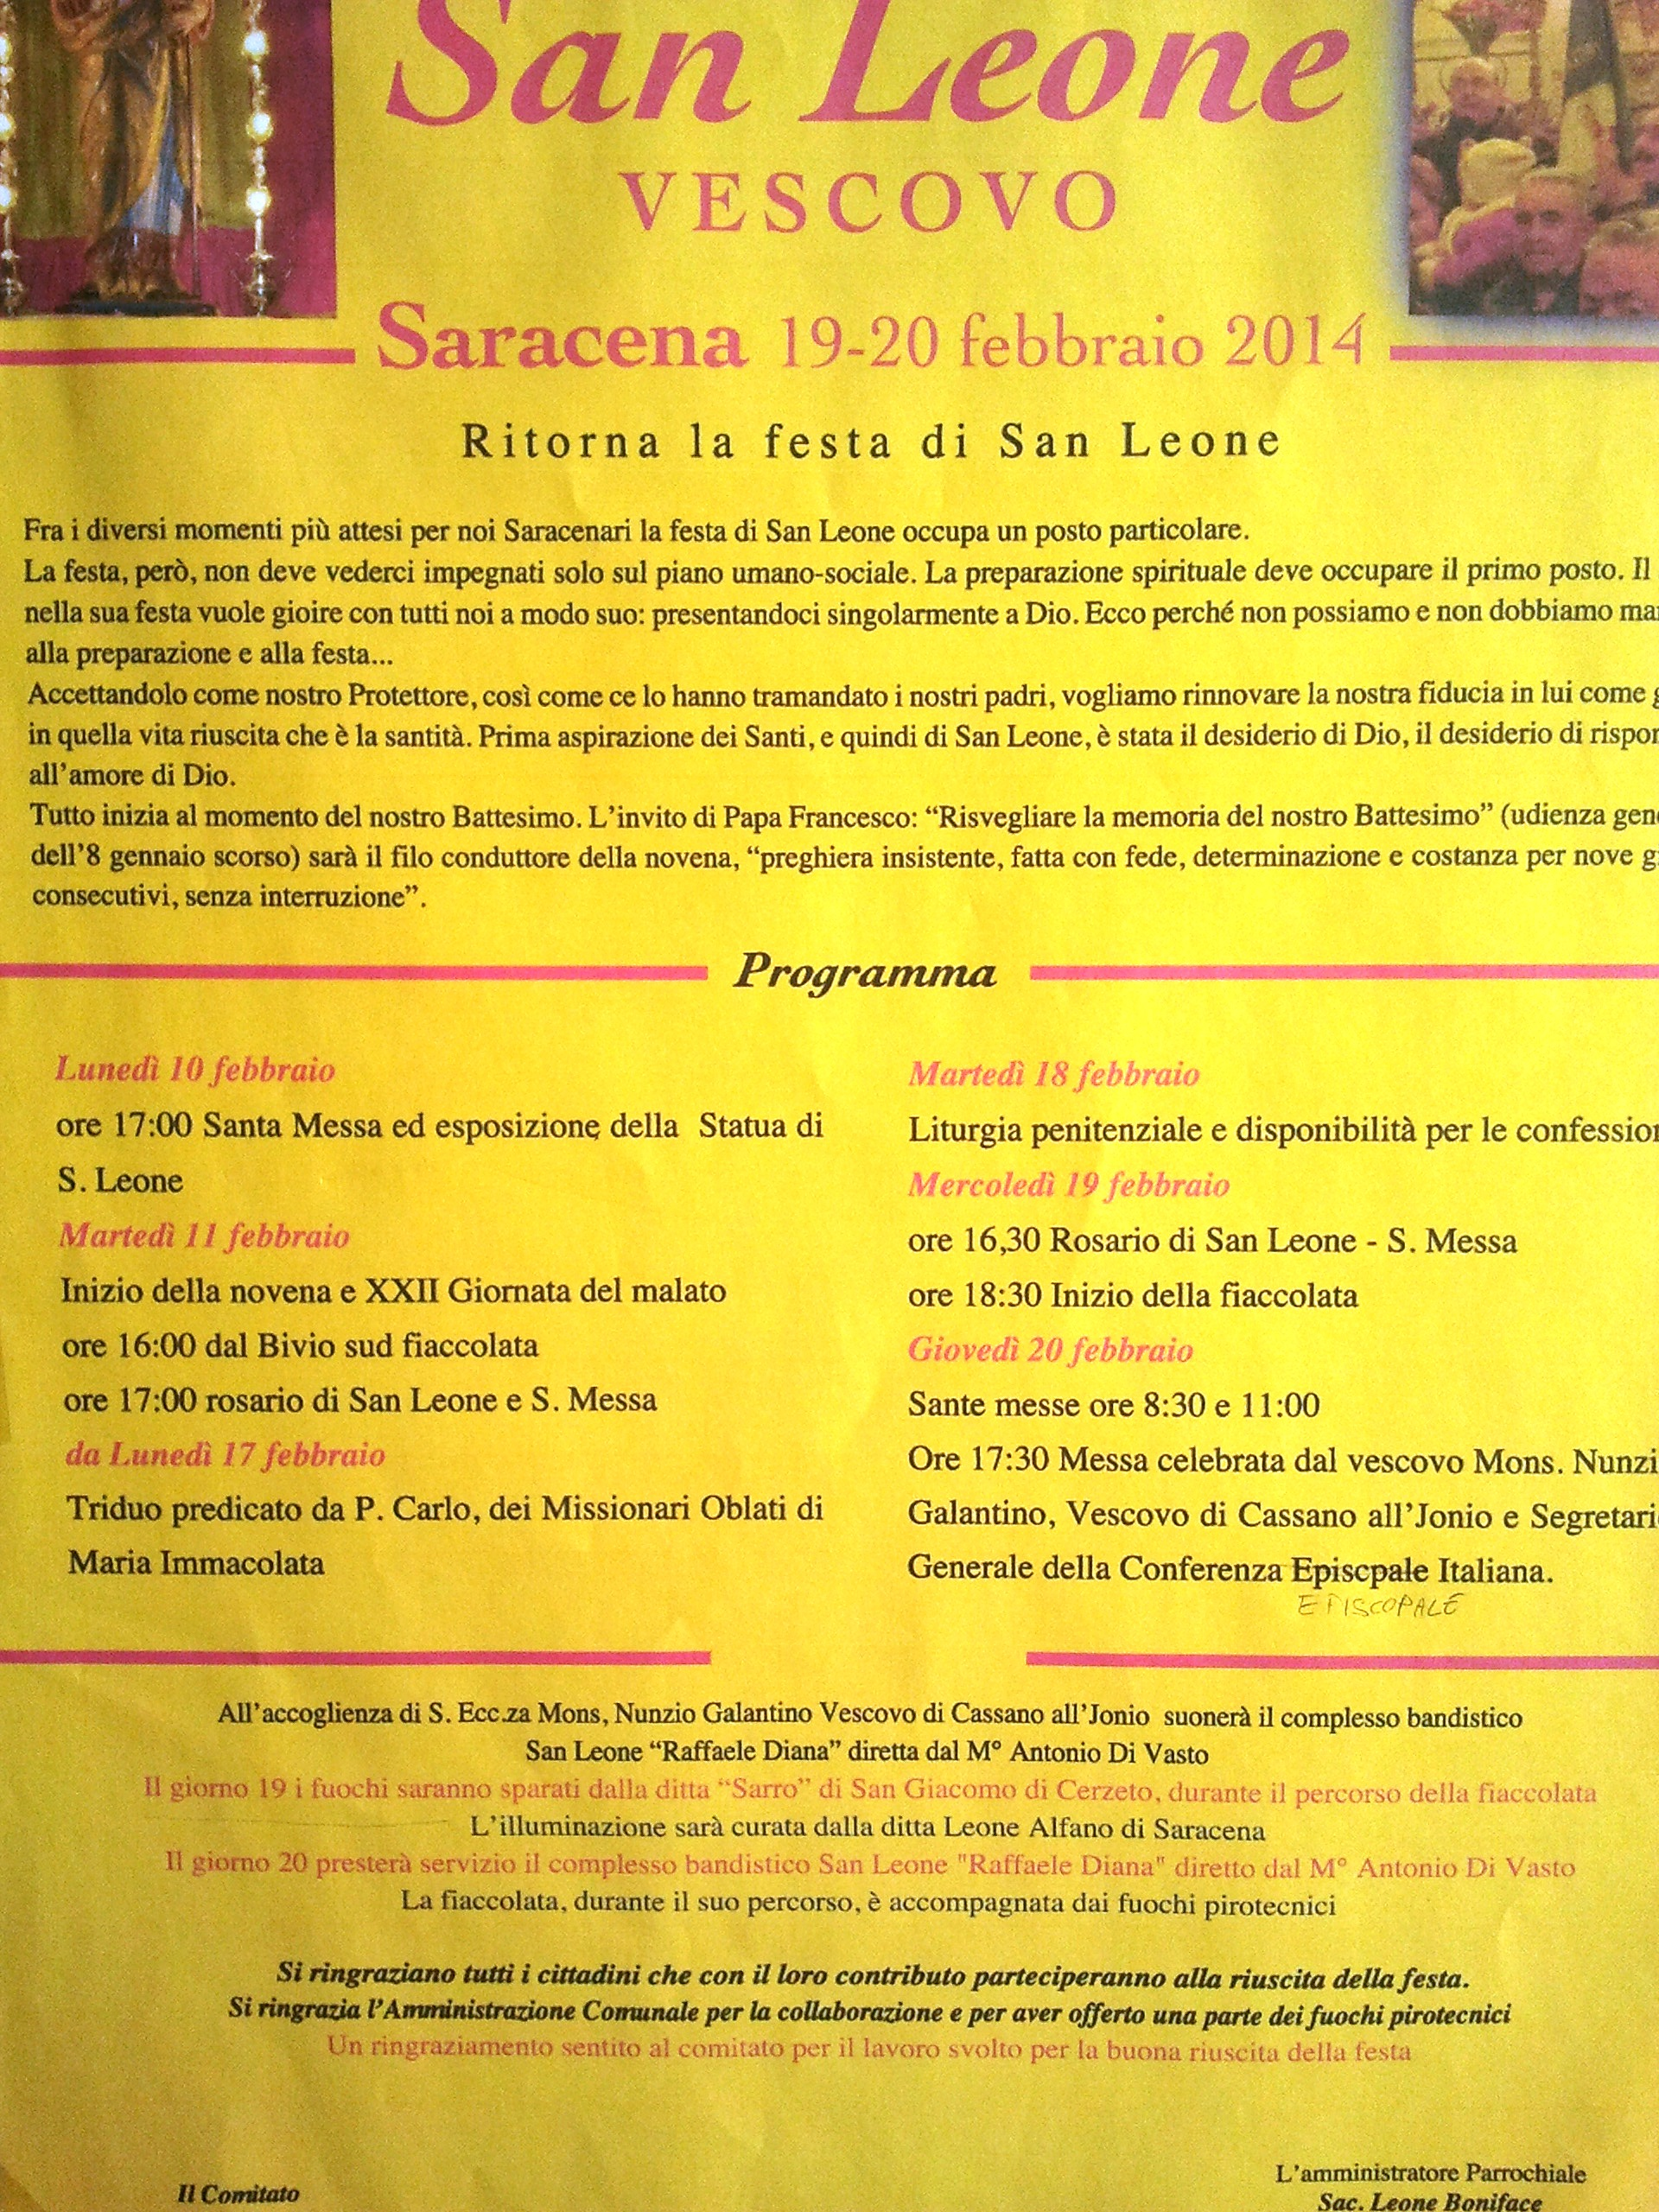 MANIFESTO-SANLEONE-180214